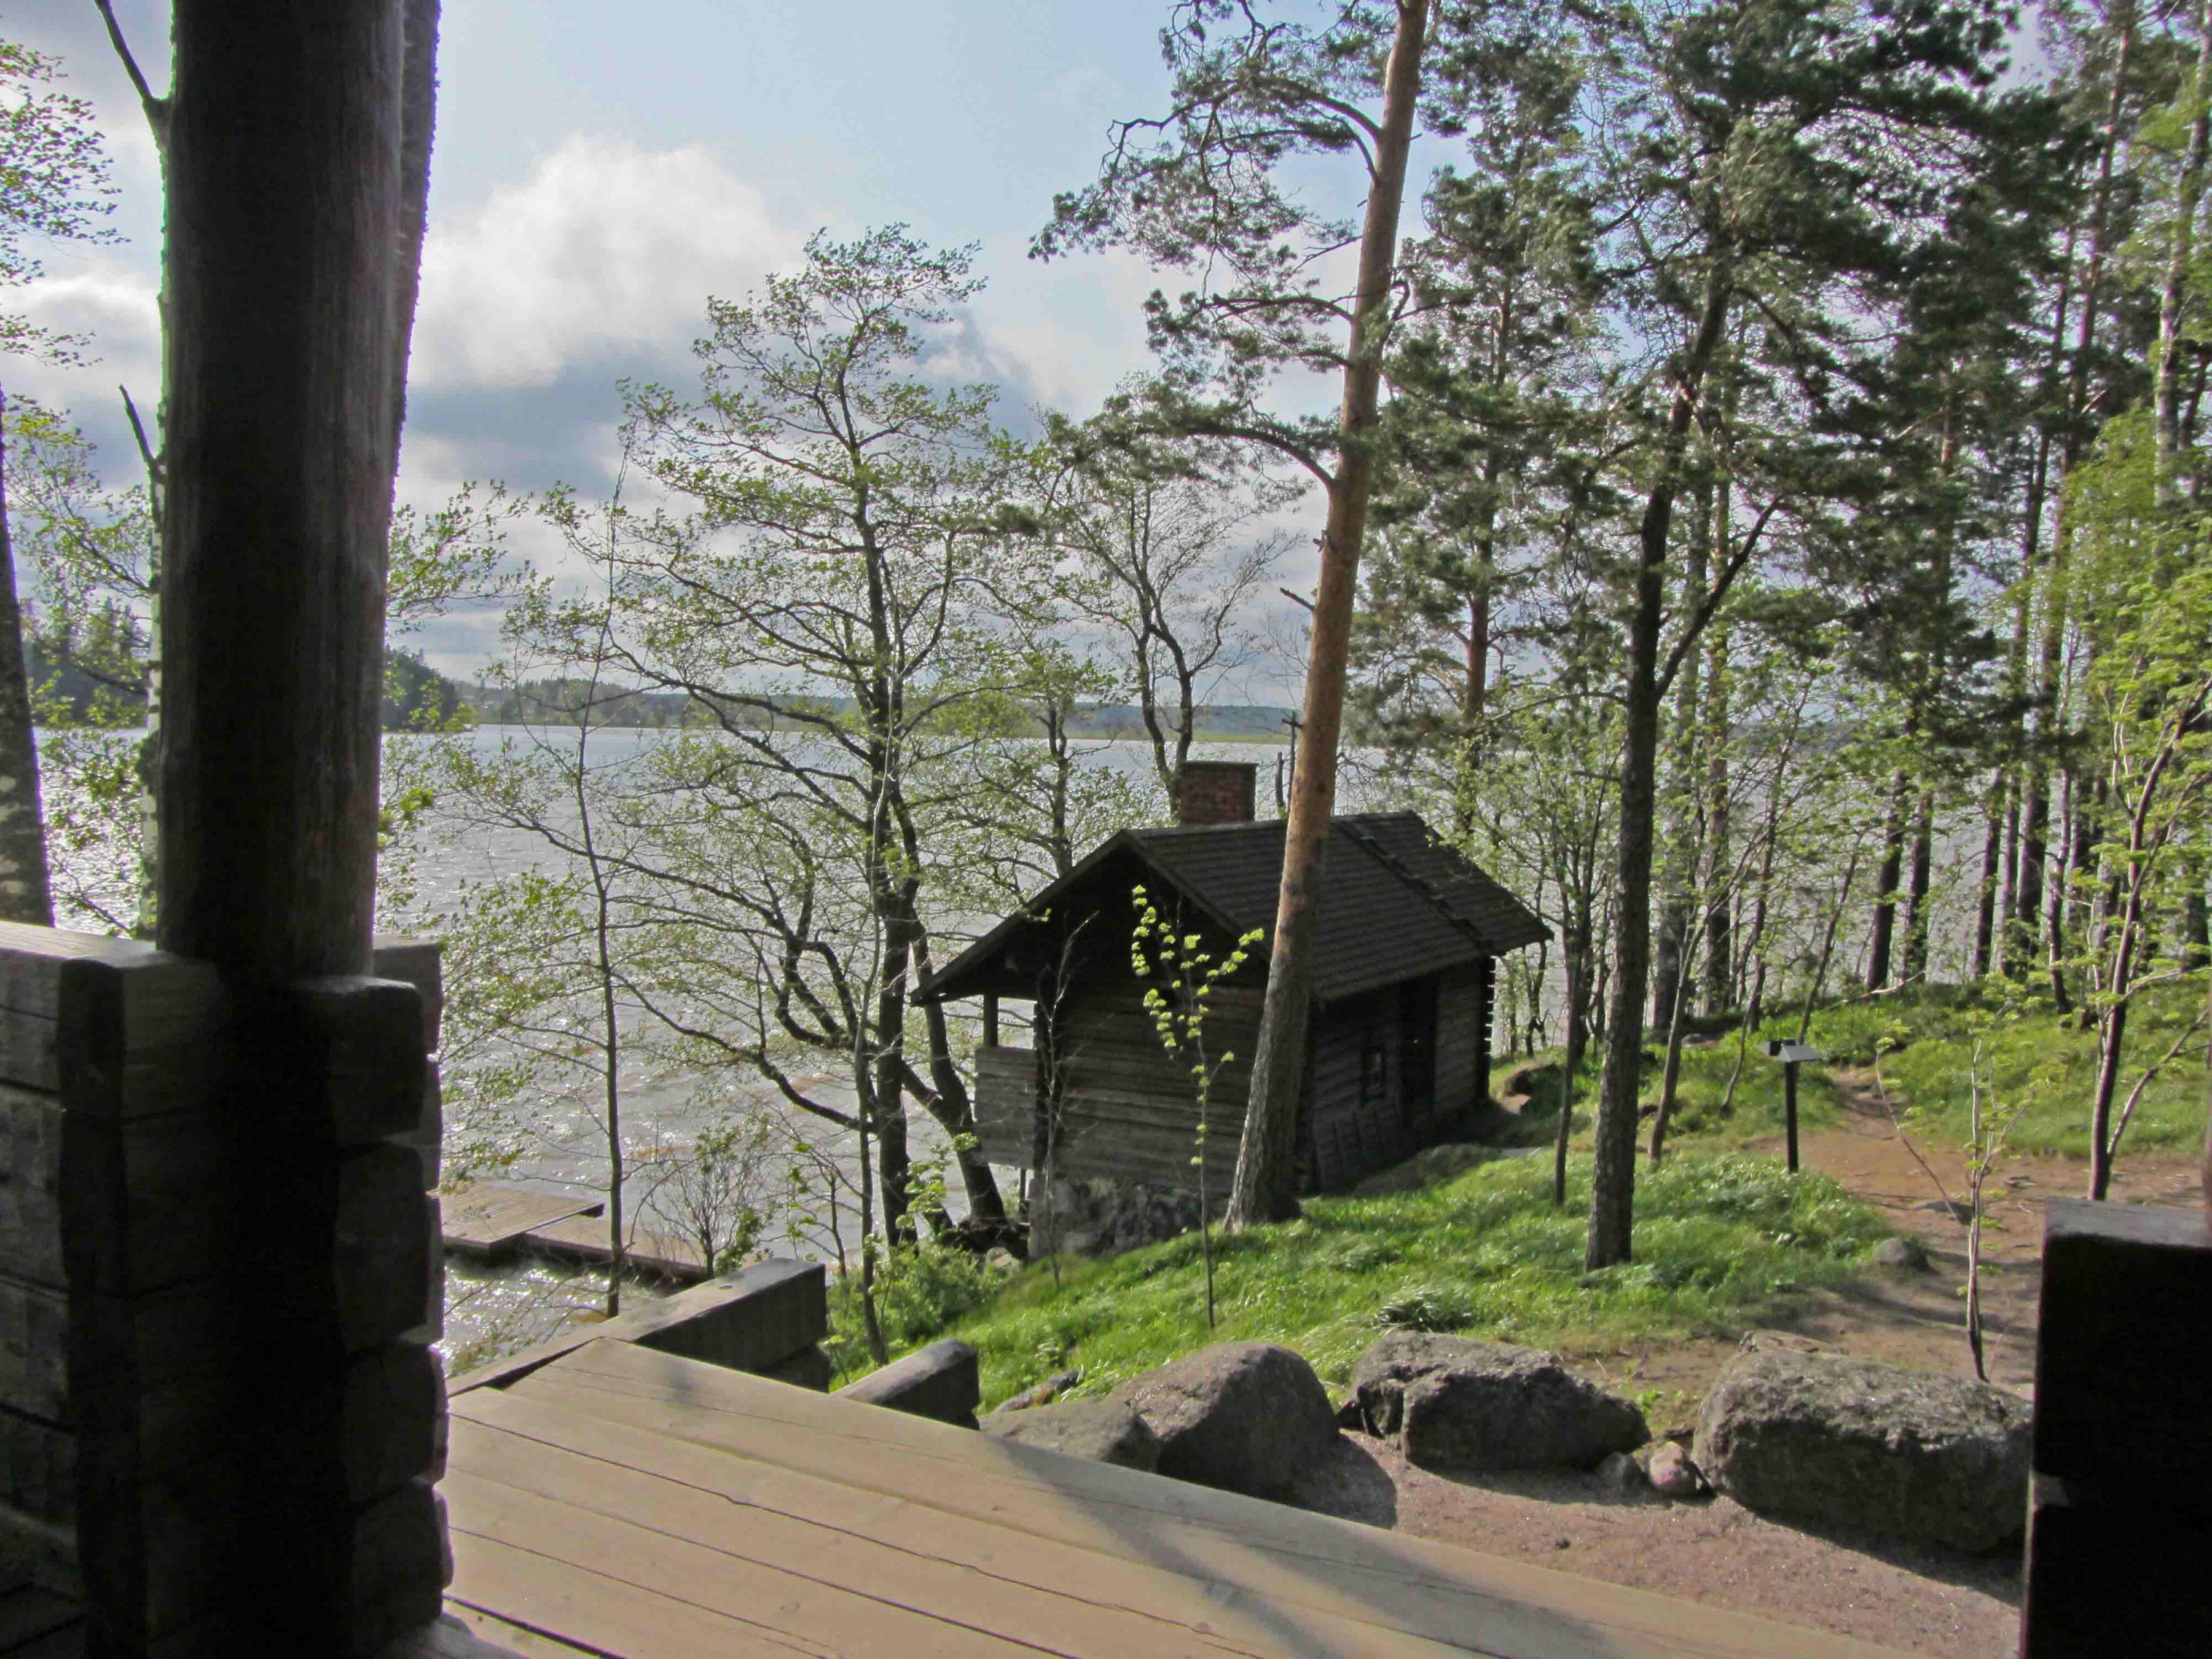 file halosenniemi sauna c img 7045 jpg wikimedia commons. Black Bedroom Furniture Sets. Home Design Ideas